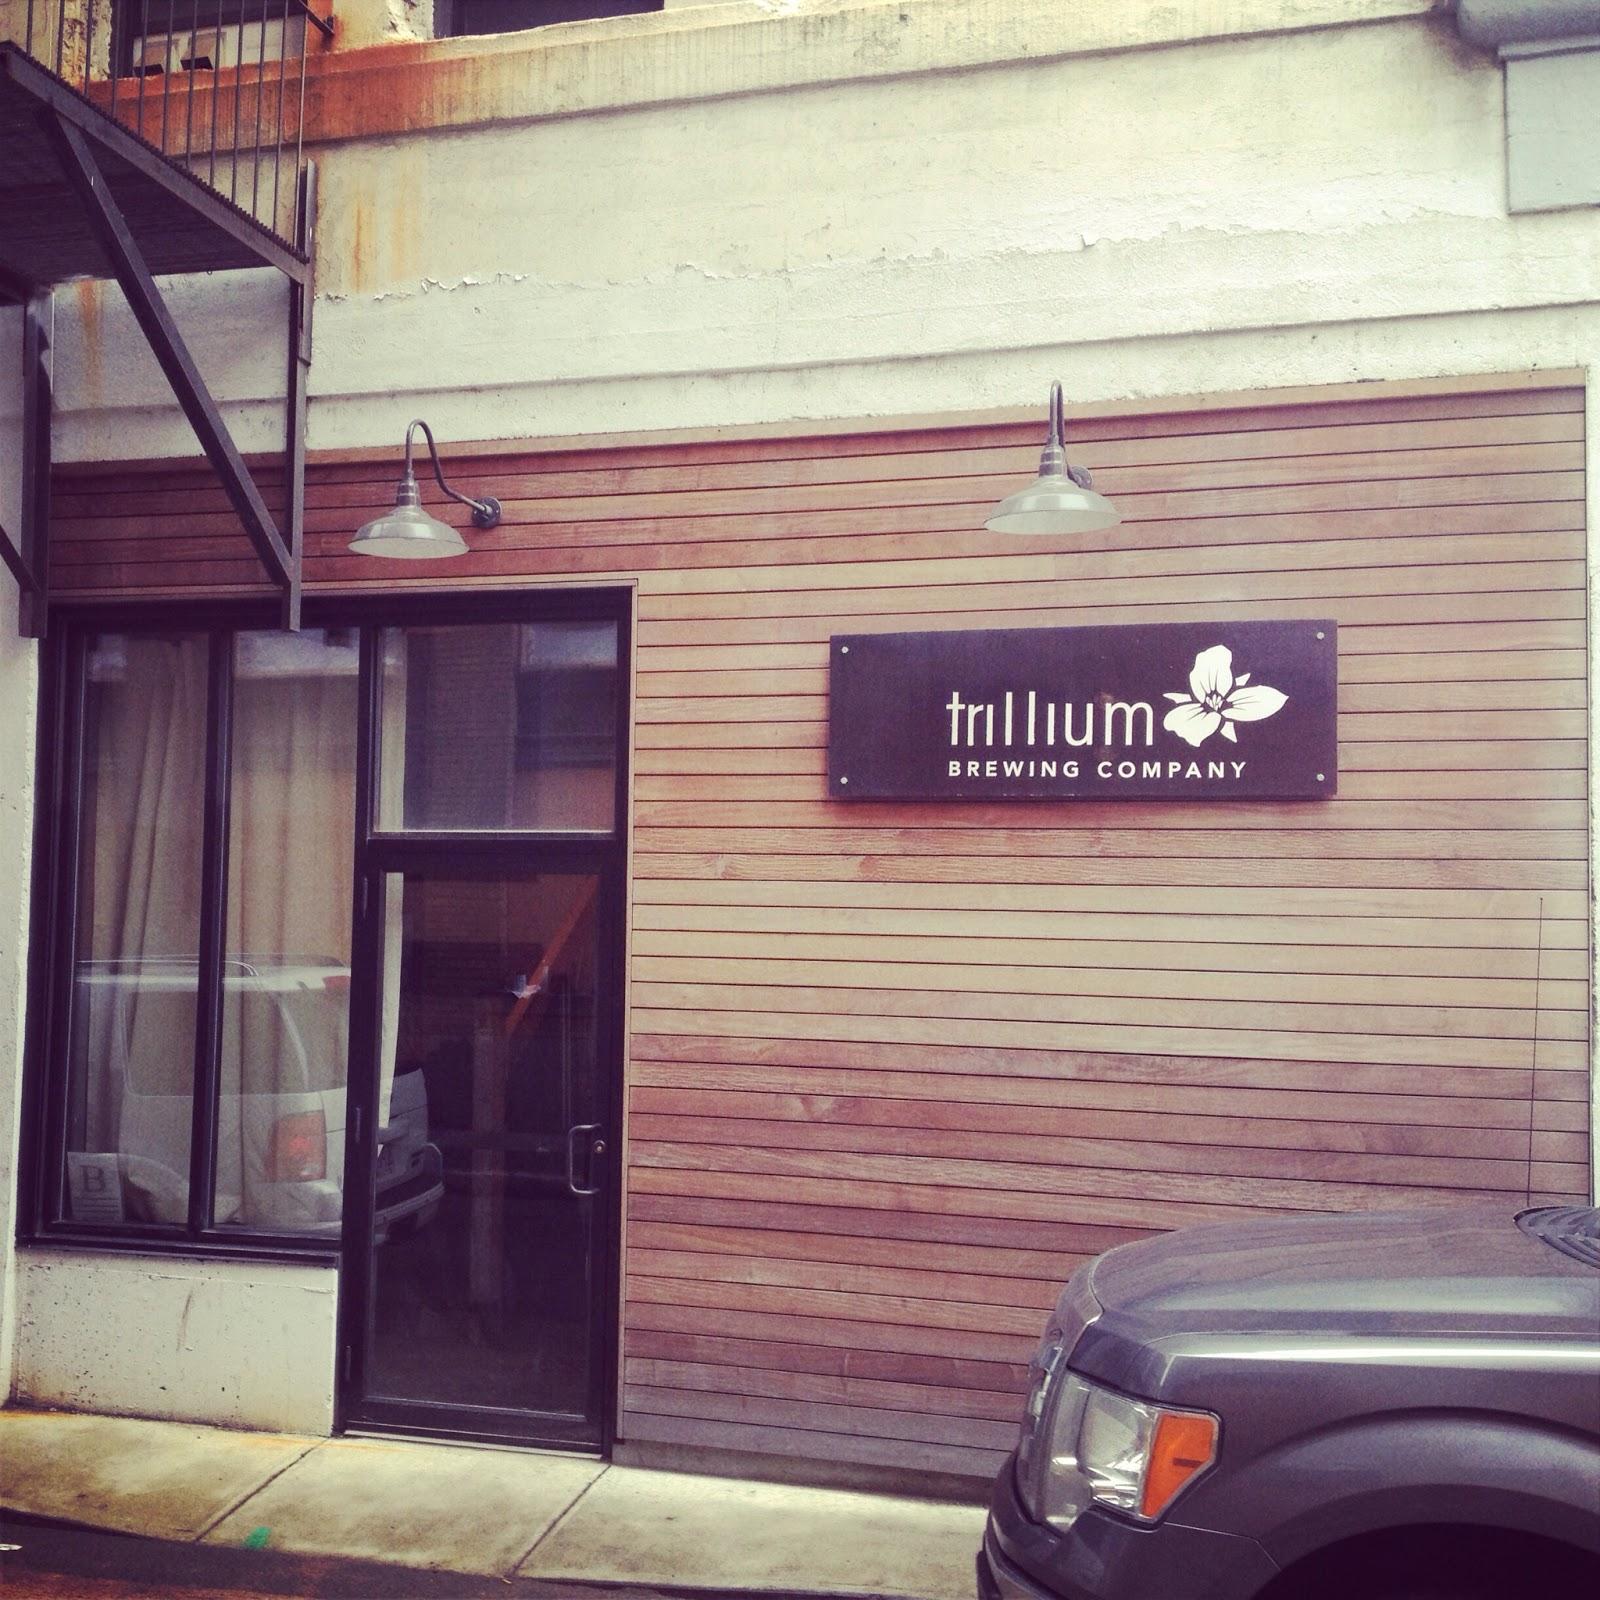 Brew England: Trillium Brewing Company Opens Doors